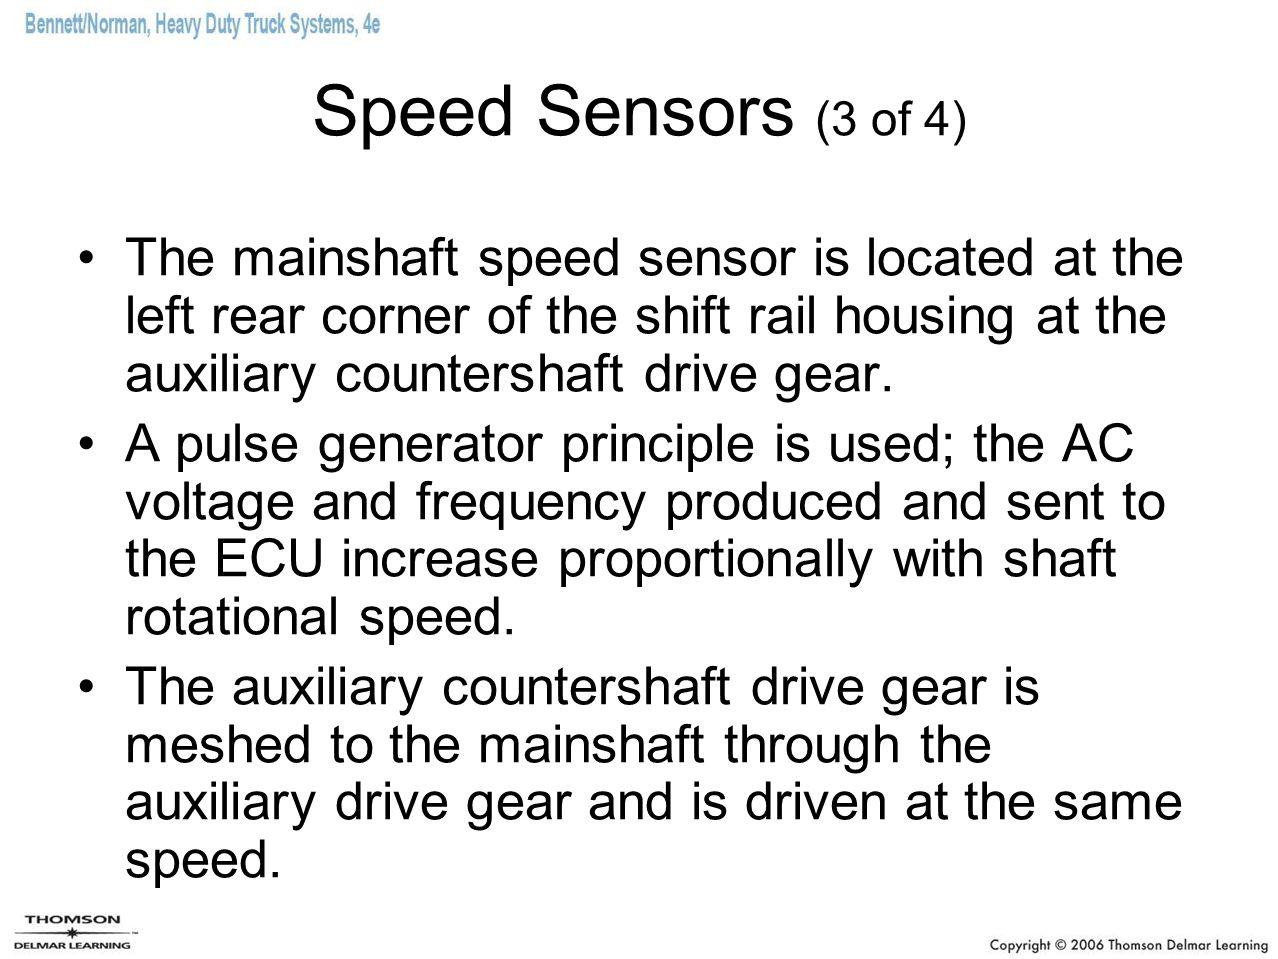 Speed Sensors (3 of 4)